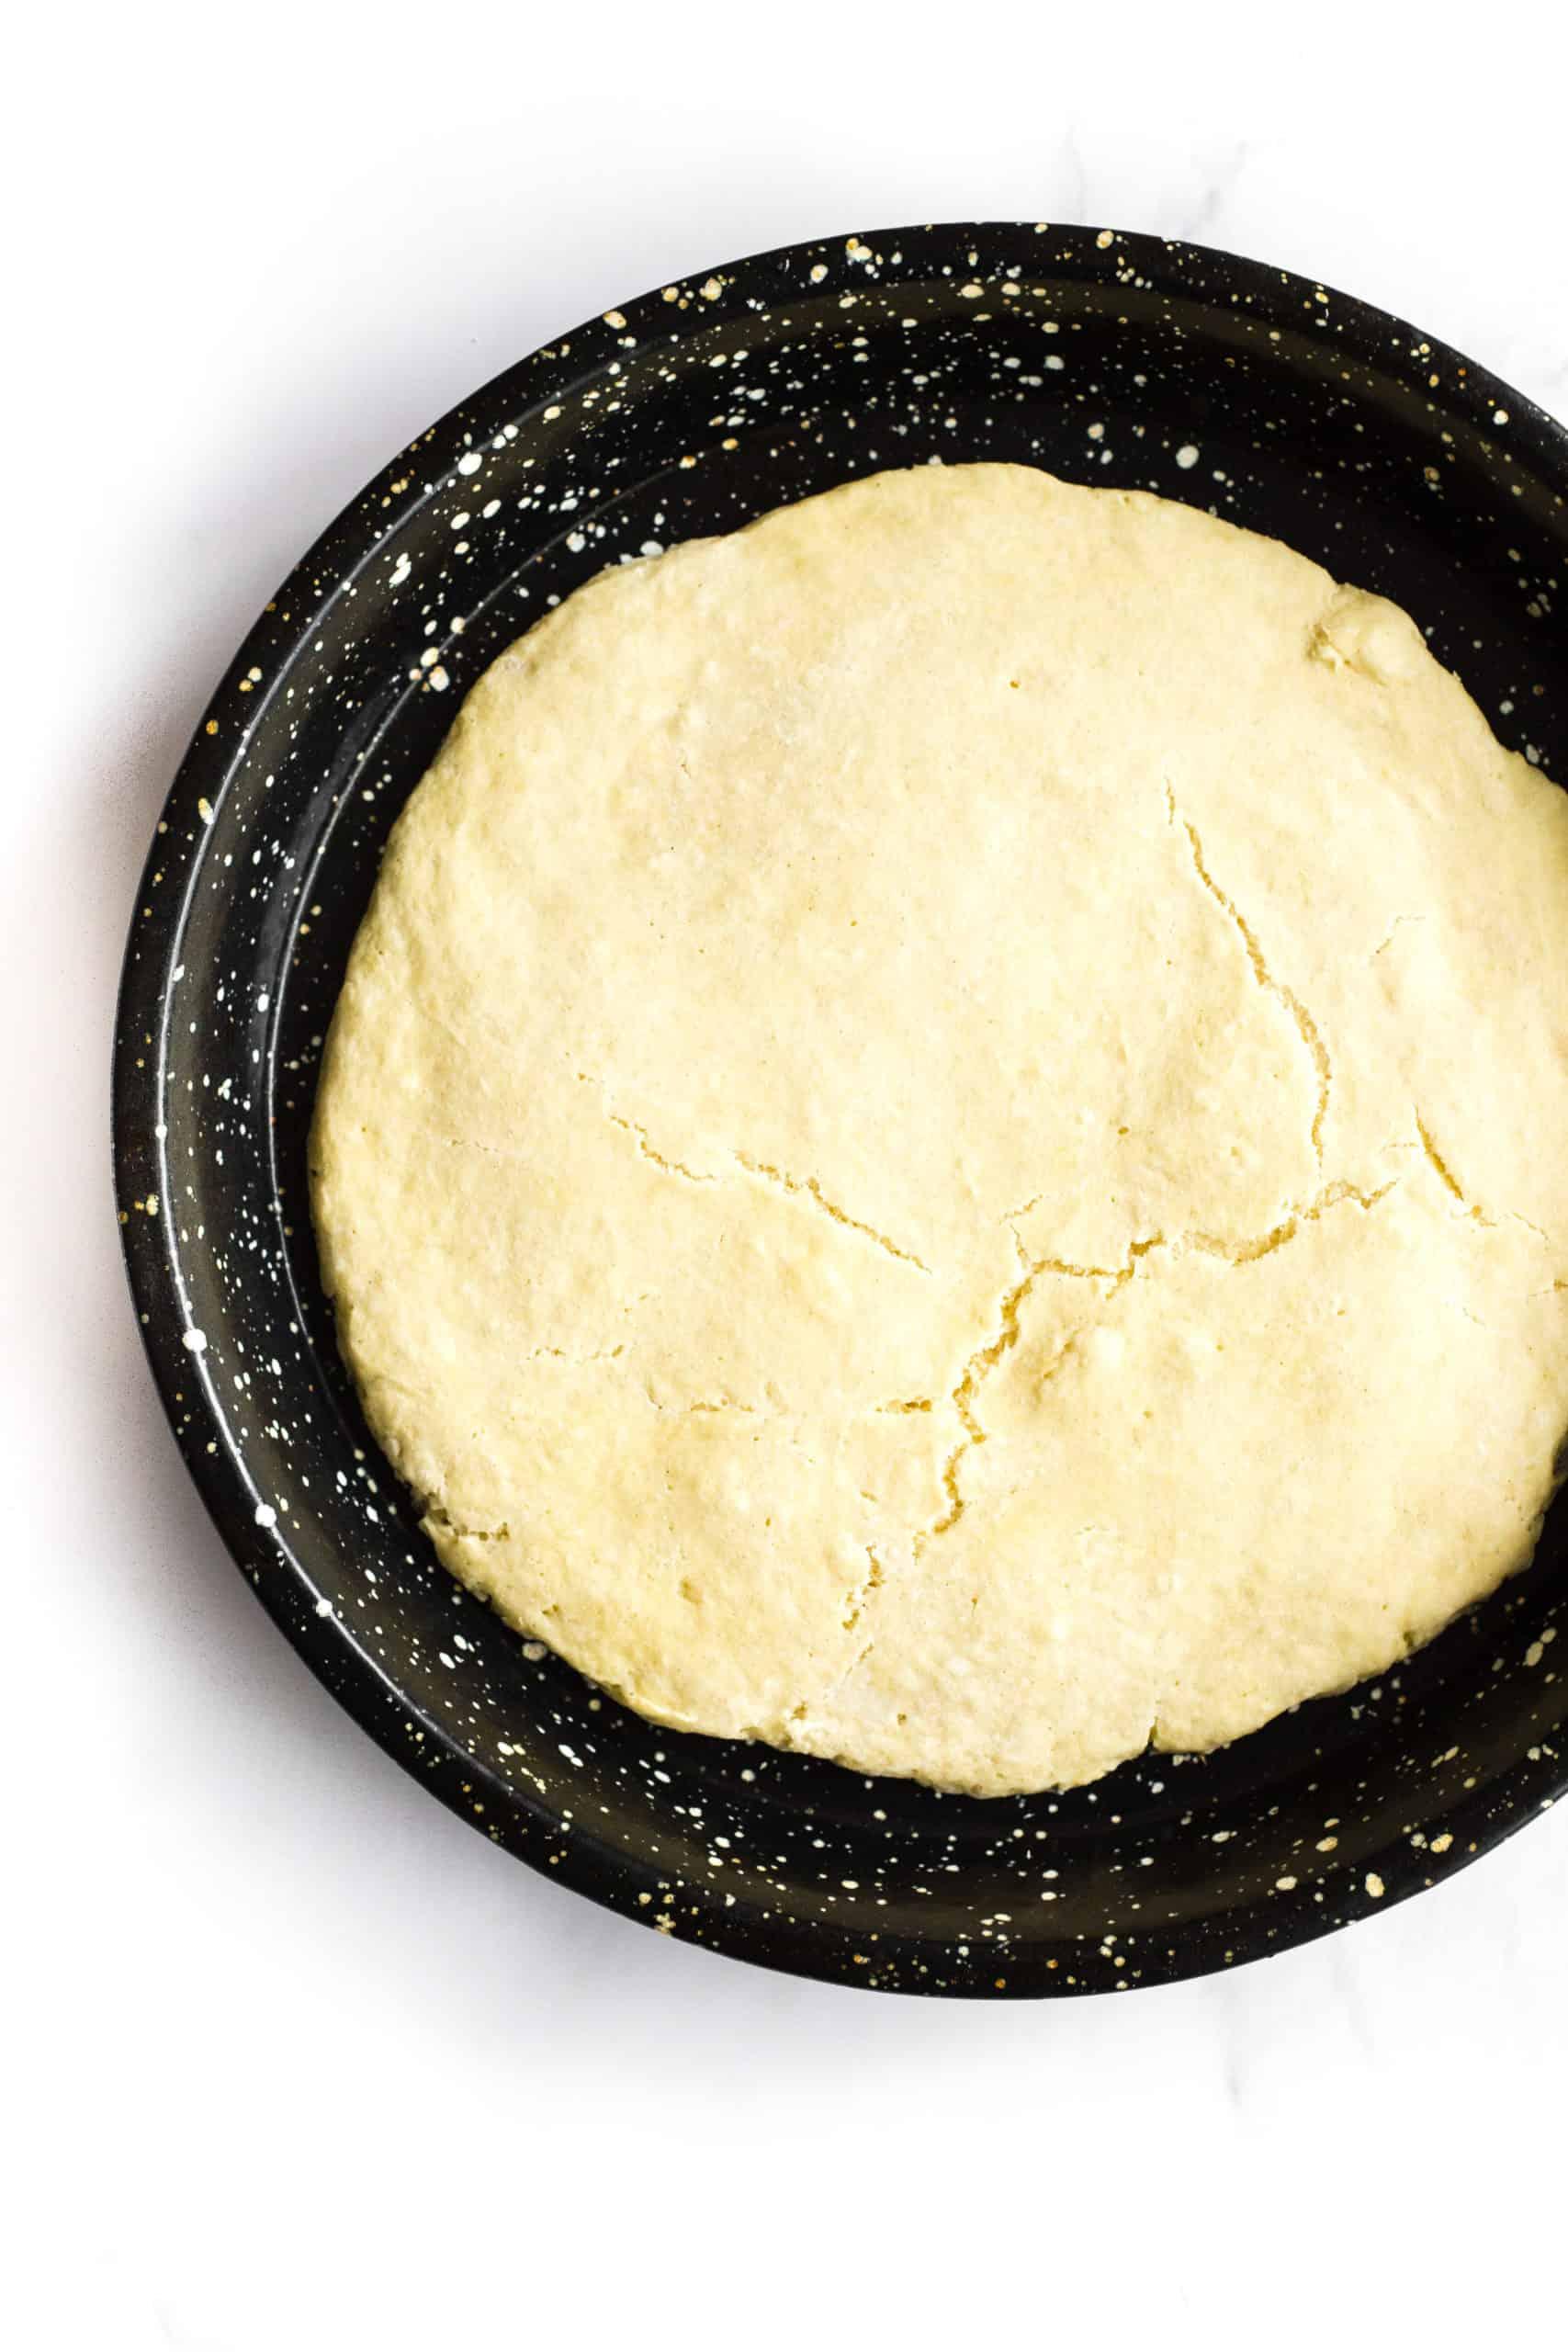 Gluten-free pizza crust in a pizza pan.